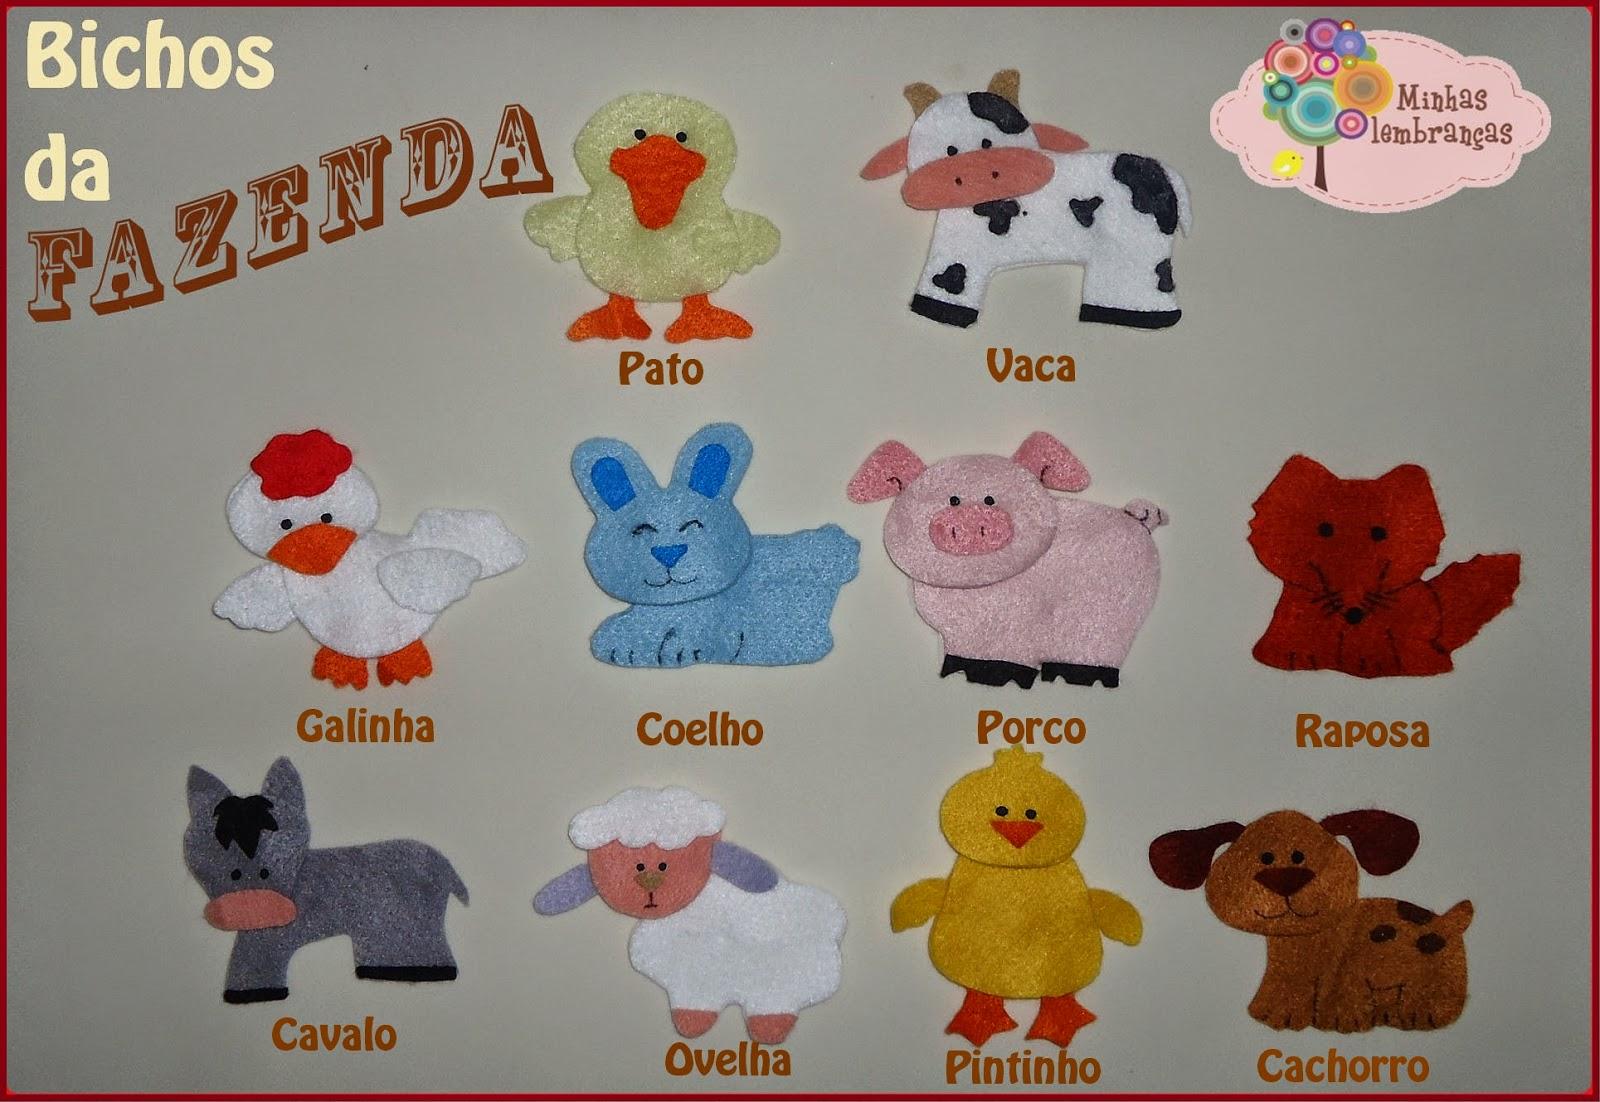 http://minhaslembrancasebrindes.blogspot.com.br/2014/07/bichos-da-fazenda.html